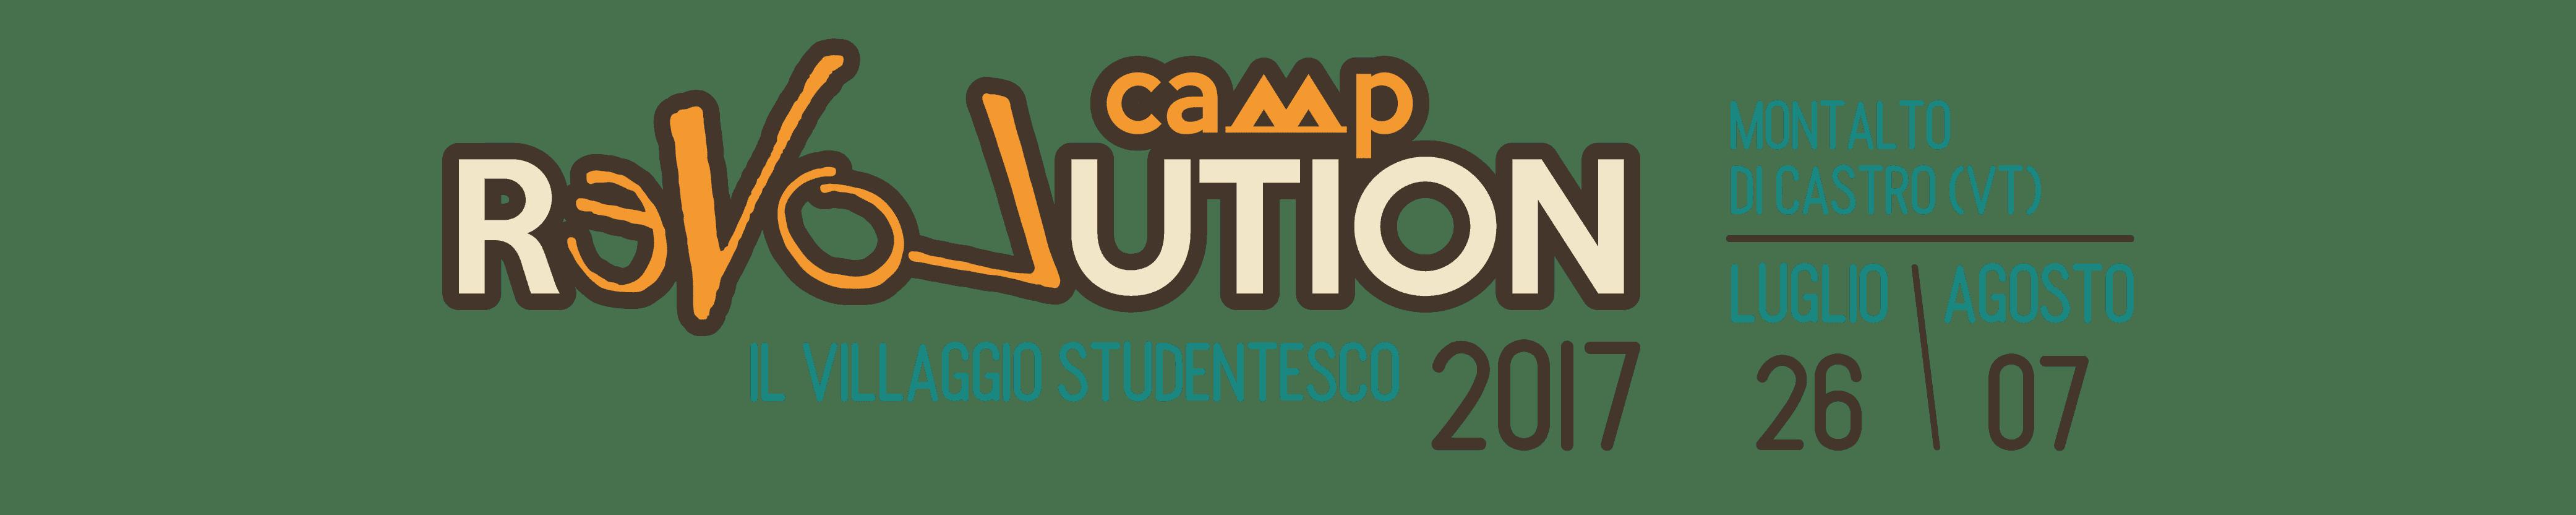 Revolution Camp 2017